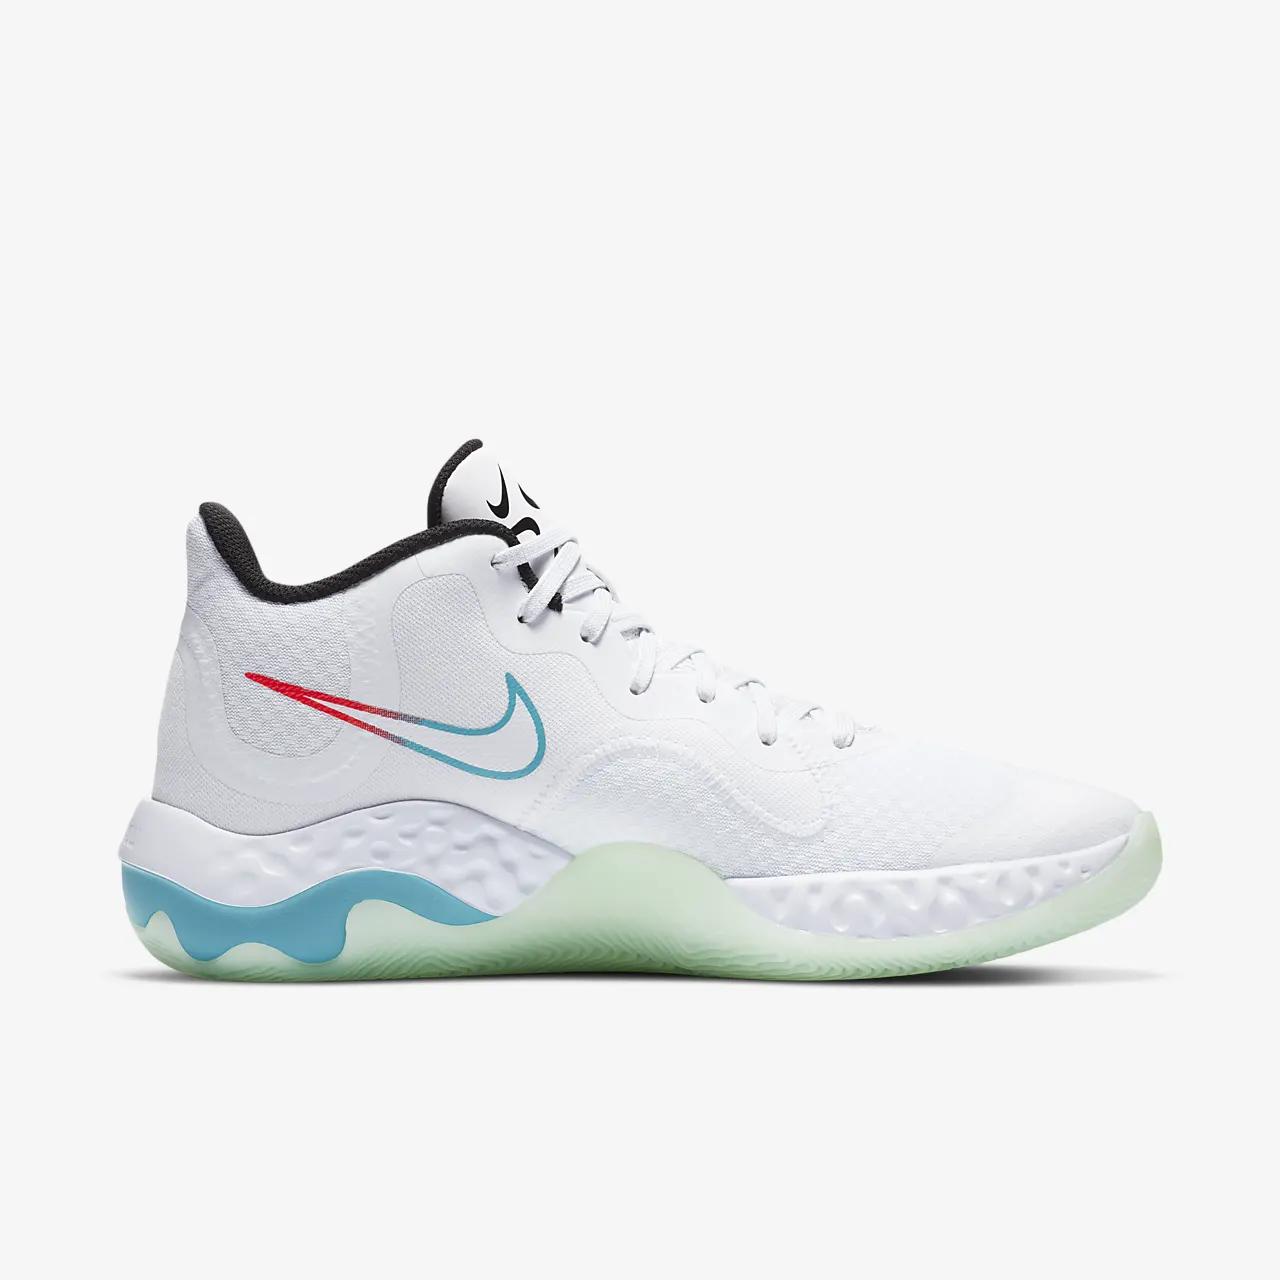 Nike Renew Elevate Basketball Shoe CK2669-100